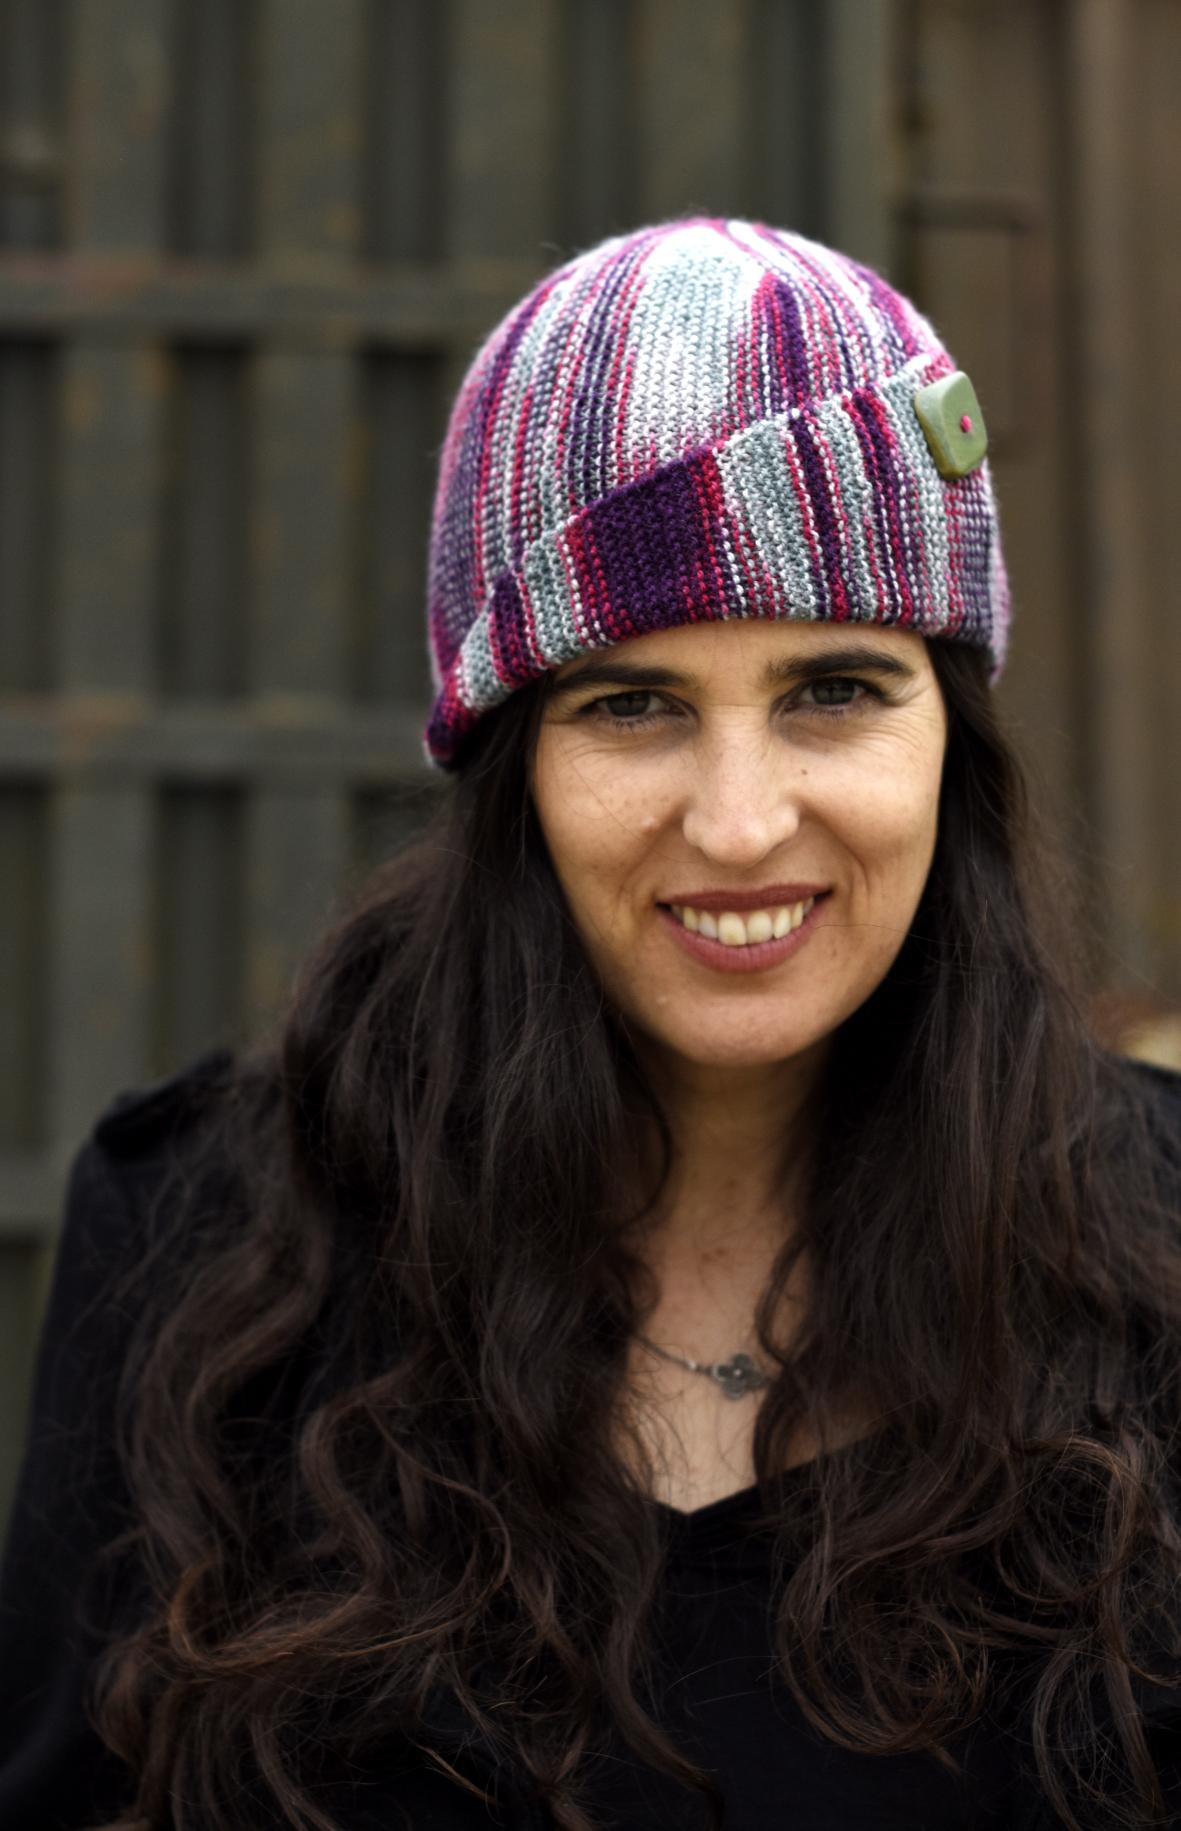 Dutrieu sideways knit cloche Hat knitting pattern